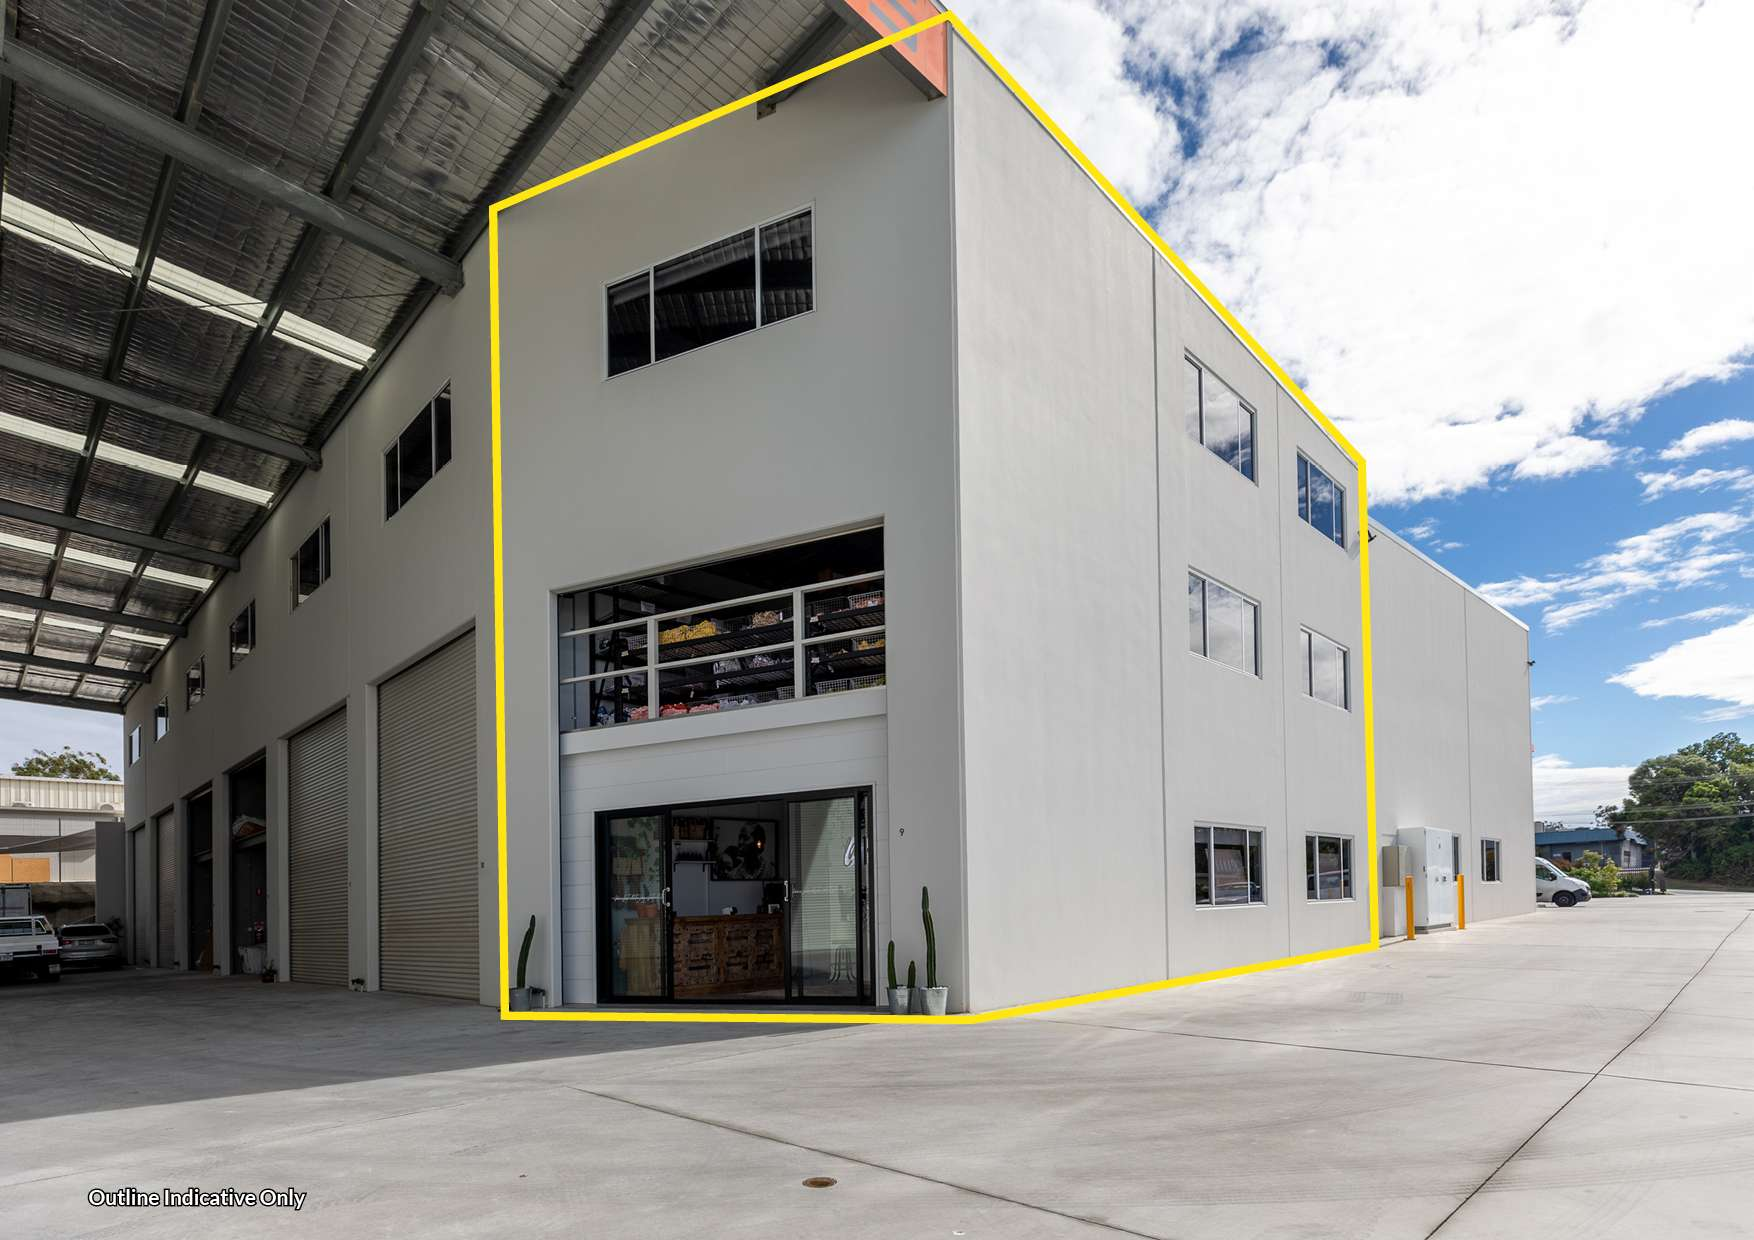 9/25 Industrial Avenue, Molendinar, QLD 4214 - Industrial